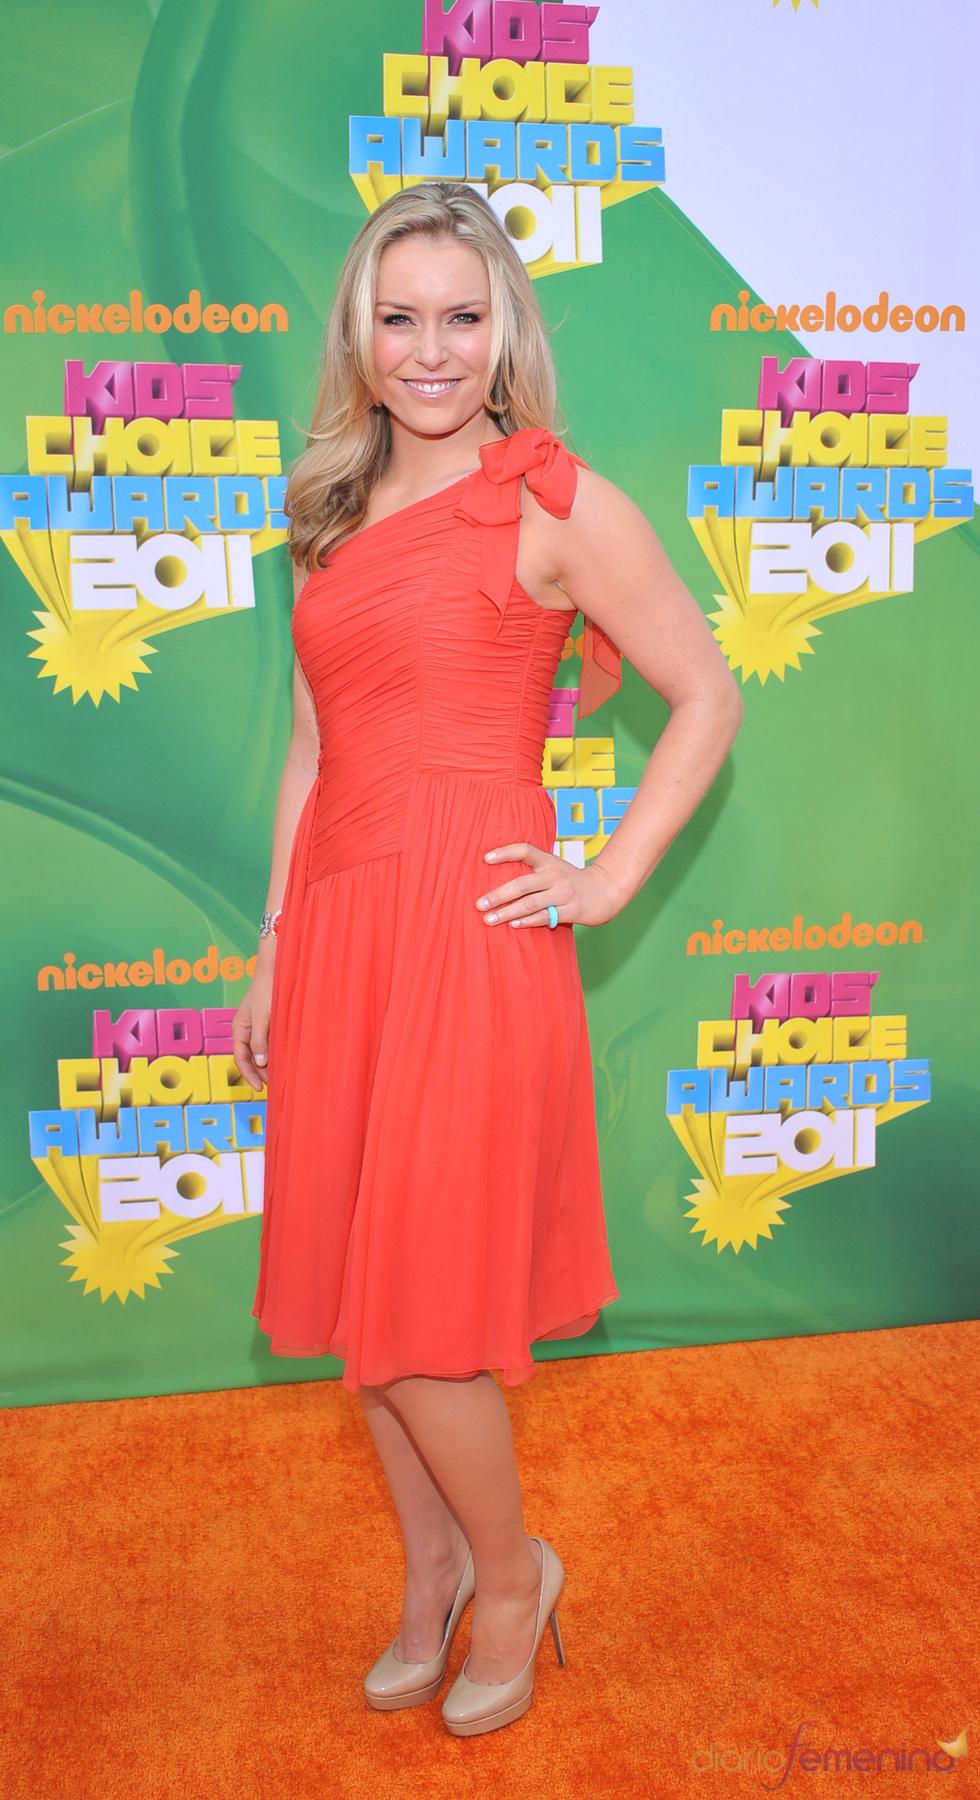 La atleta Lindsay Vonn en la alfombra roja de los Kids' Choice Awards